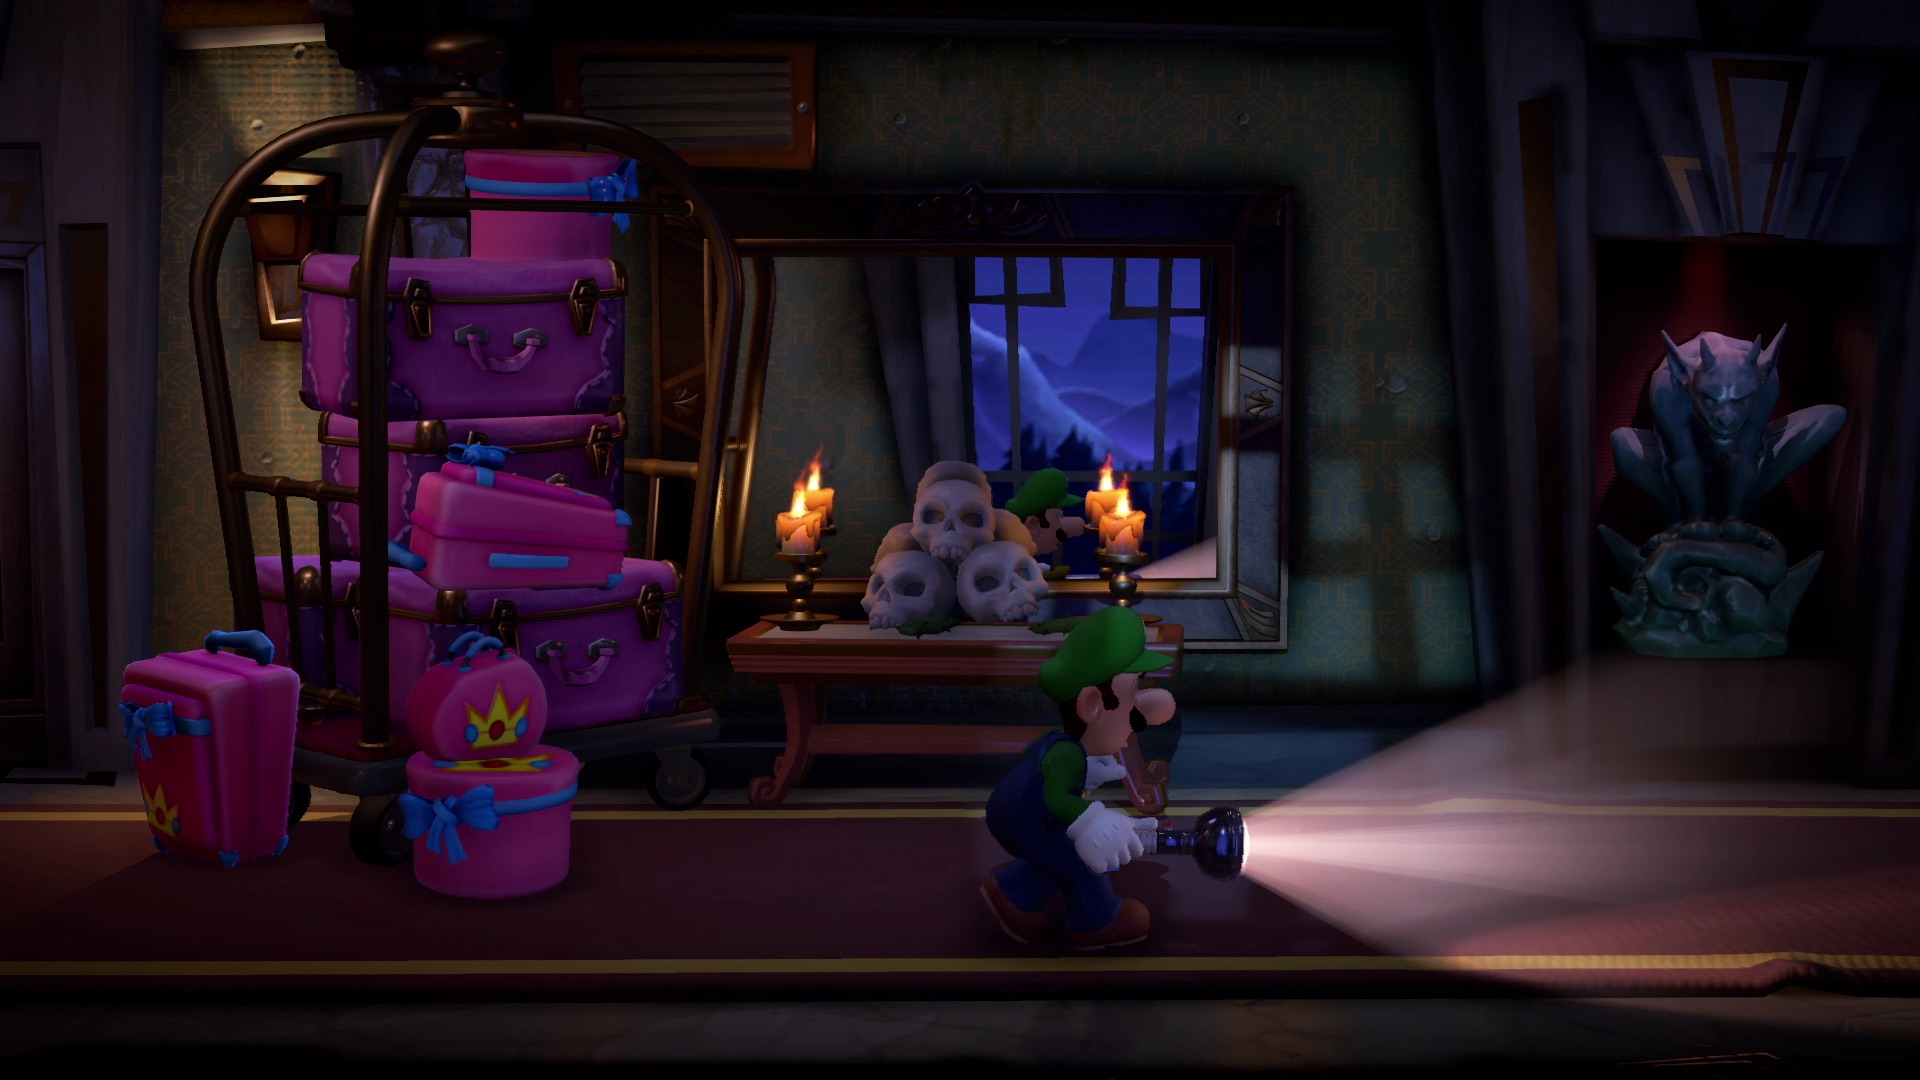 Luigi's Mansion 3 E3 2019 Screenshot 11